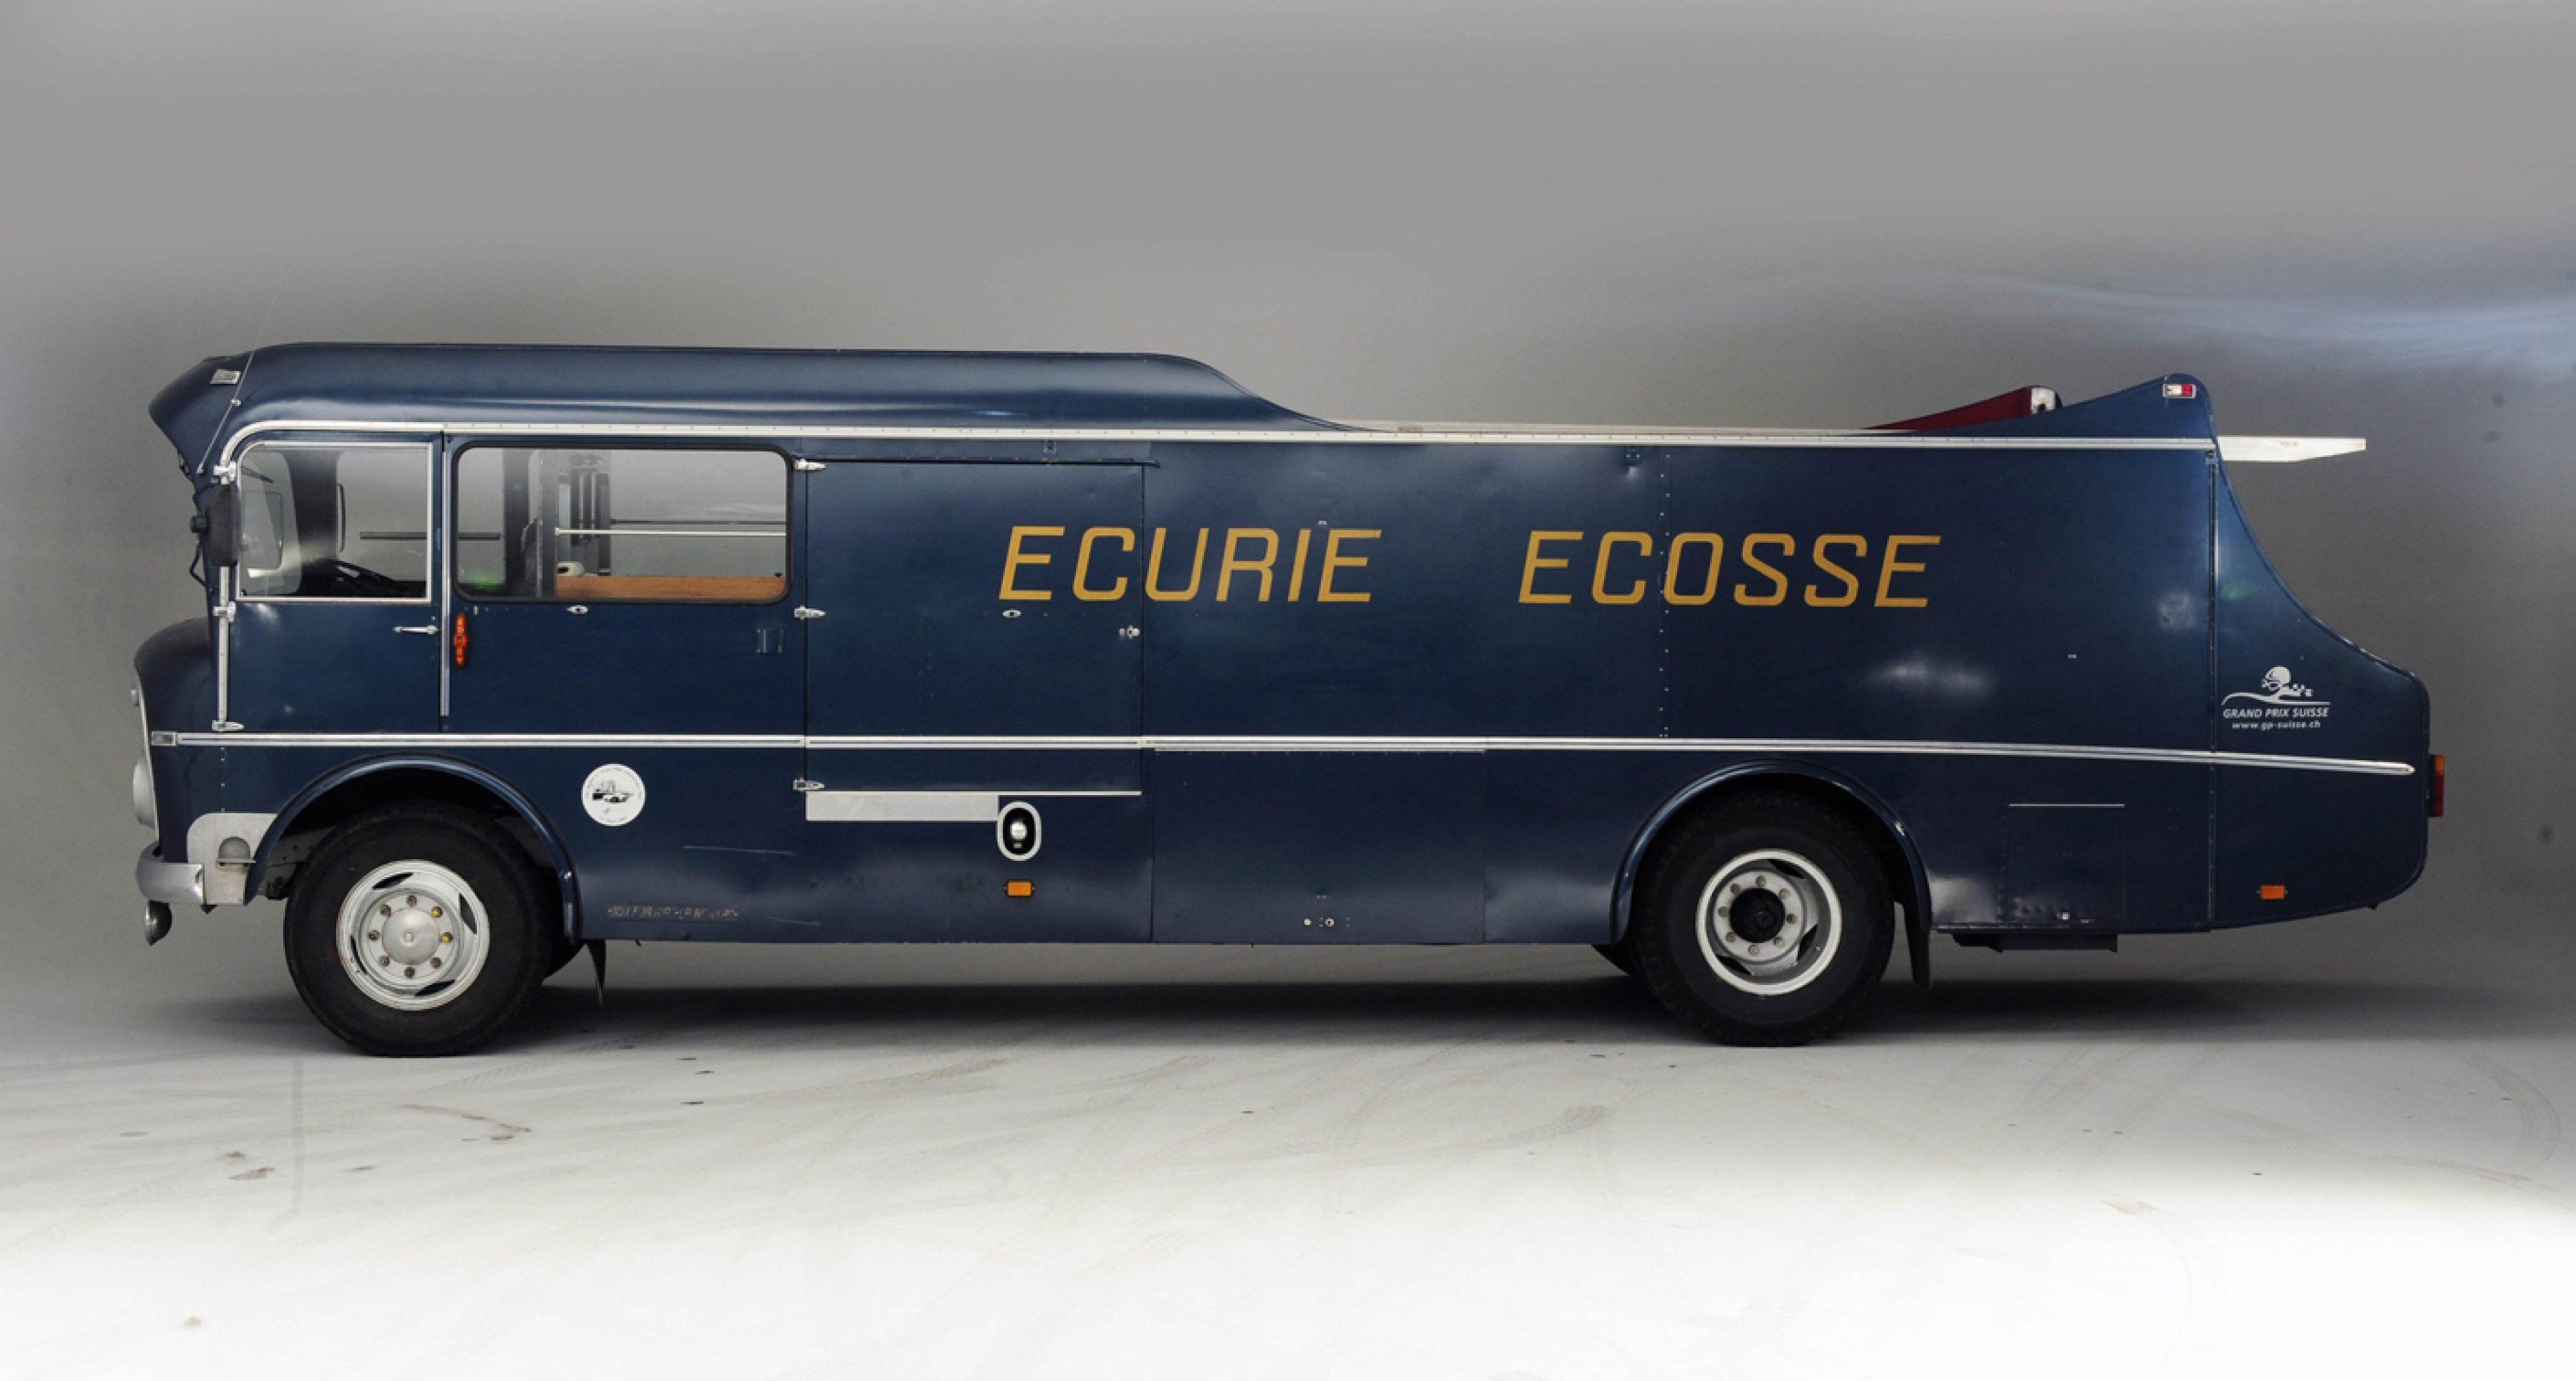 Ecurie Ecosse's famous Commer Transporter